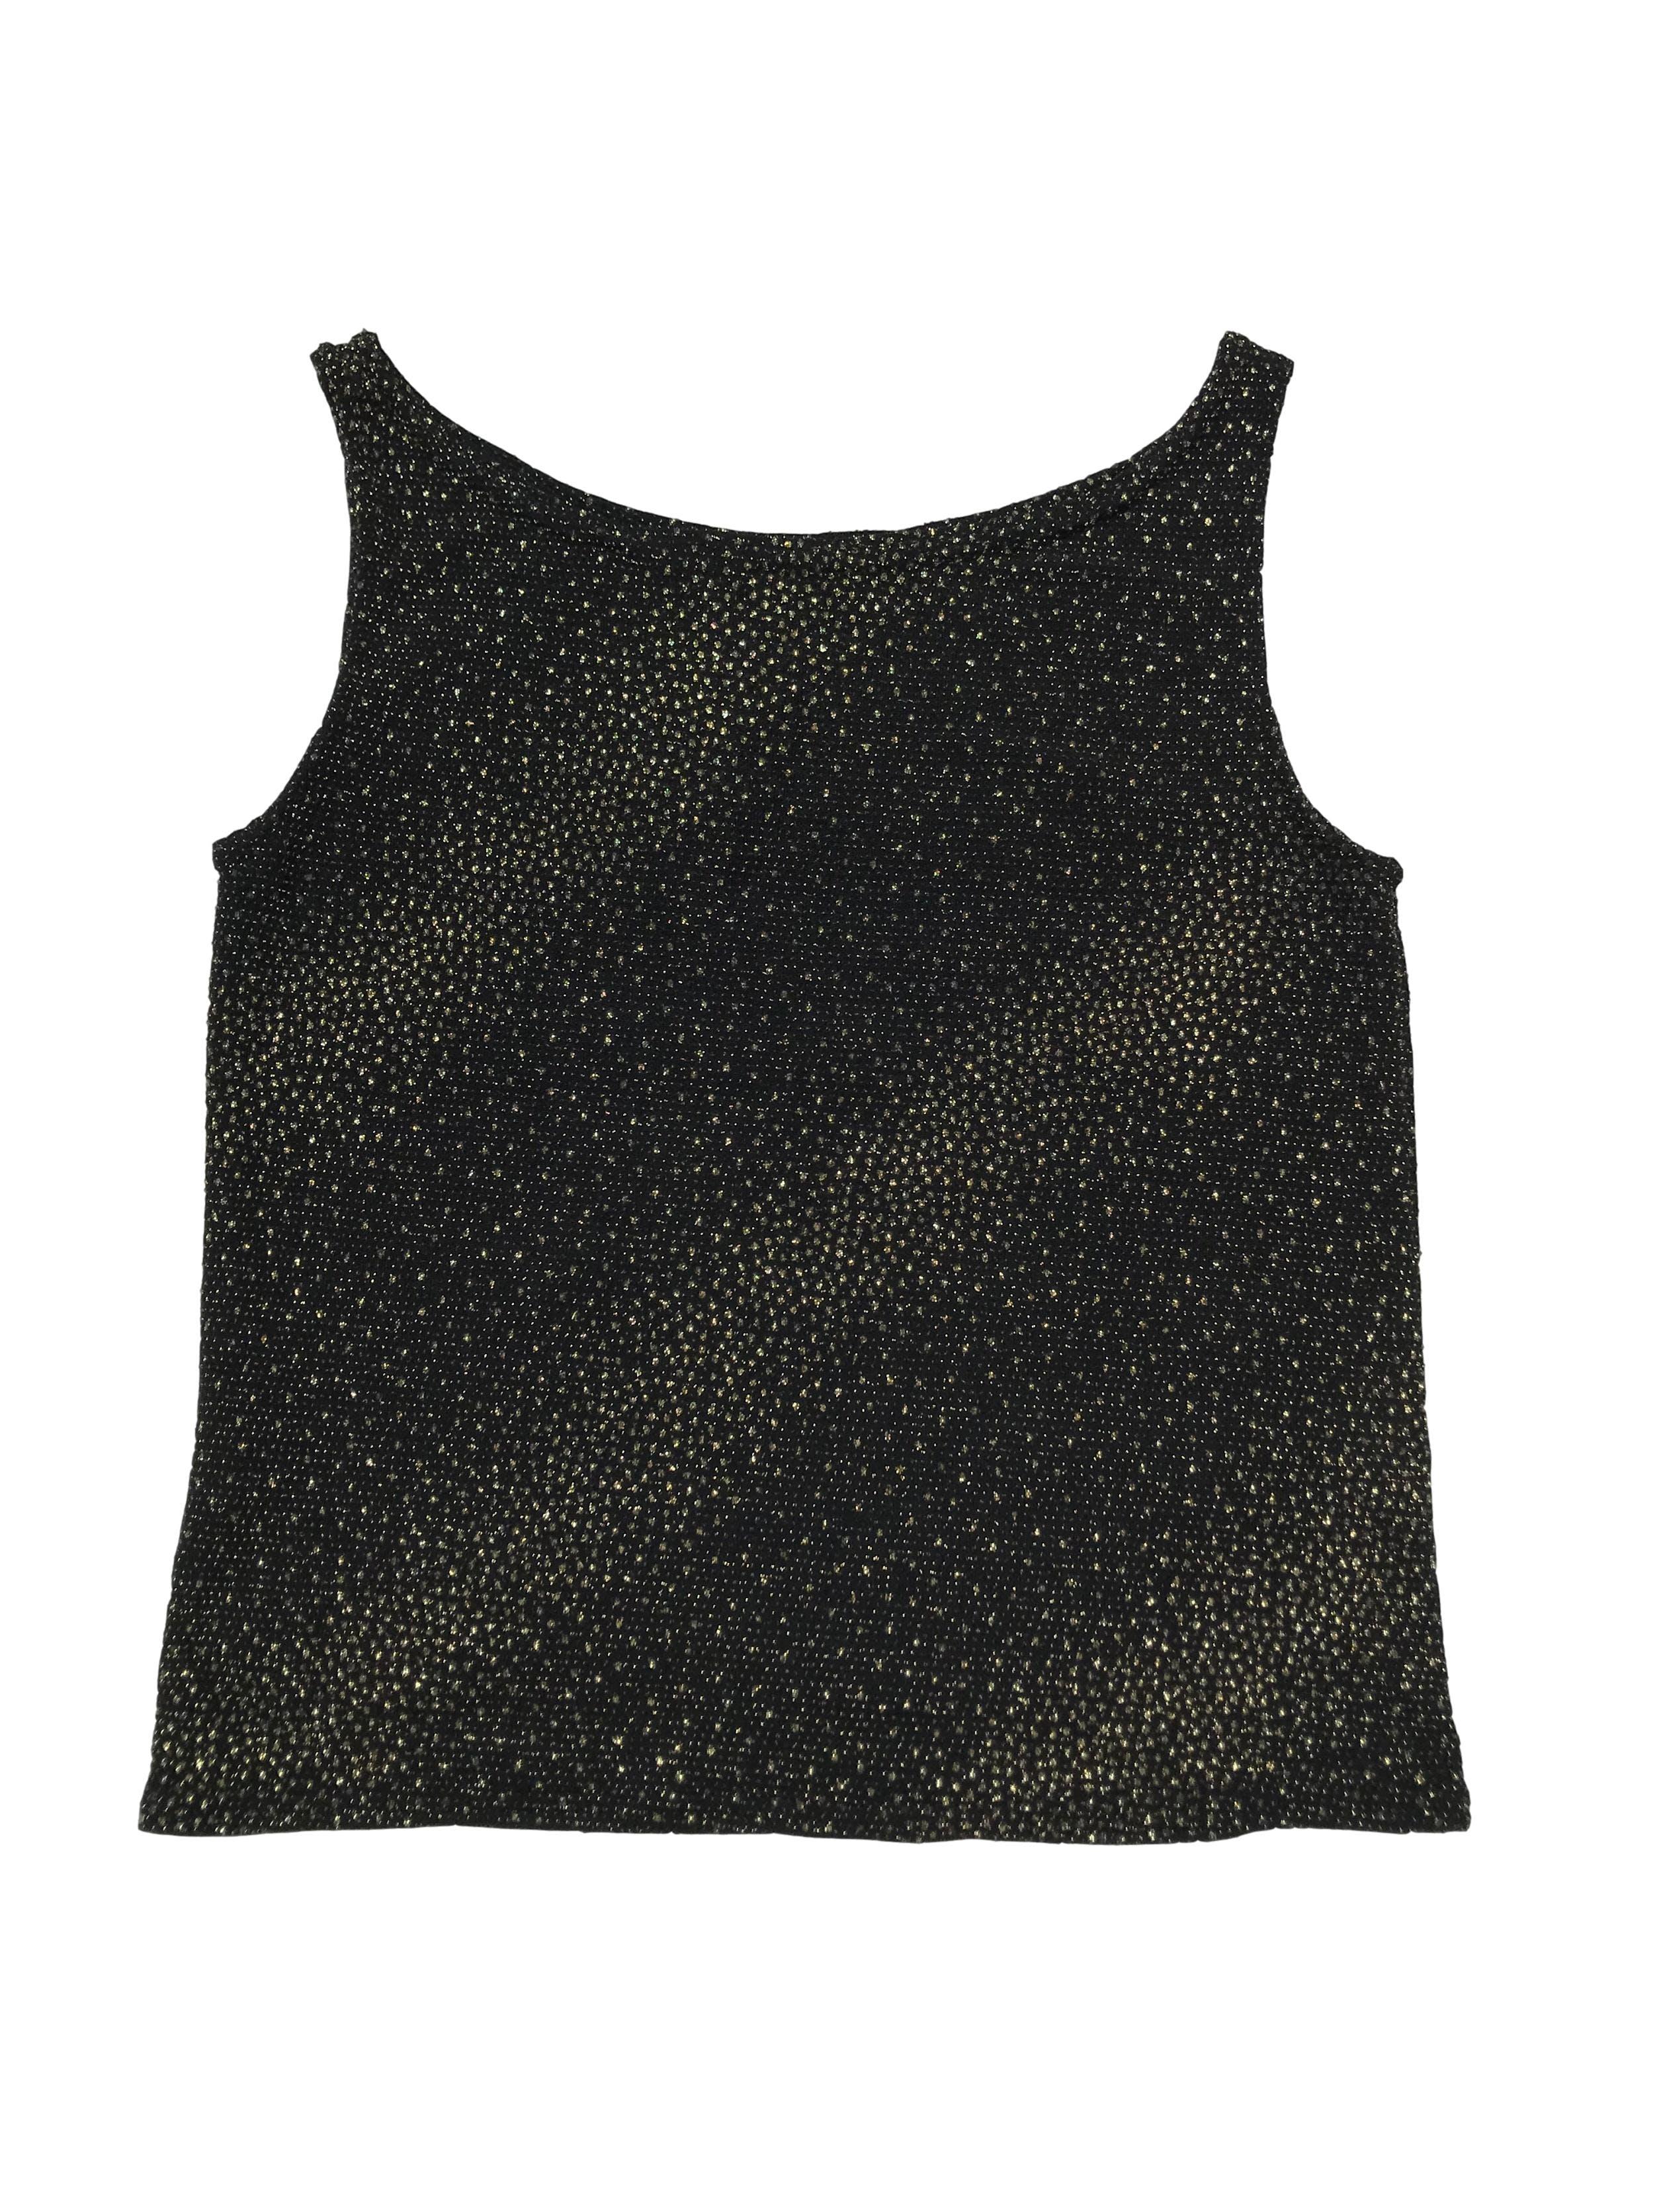 Polo negro con texturas doradas, es stretch. Largo 45cm